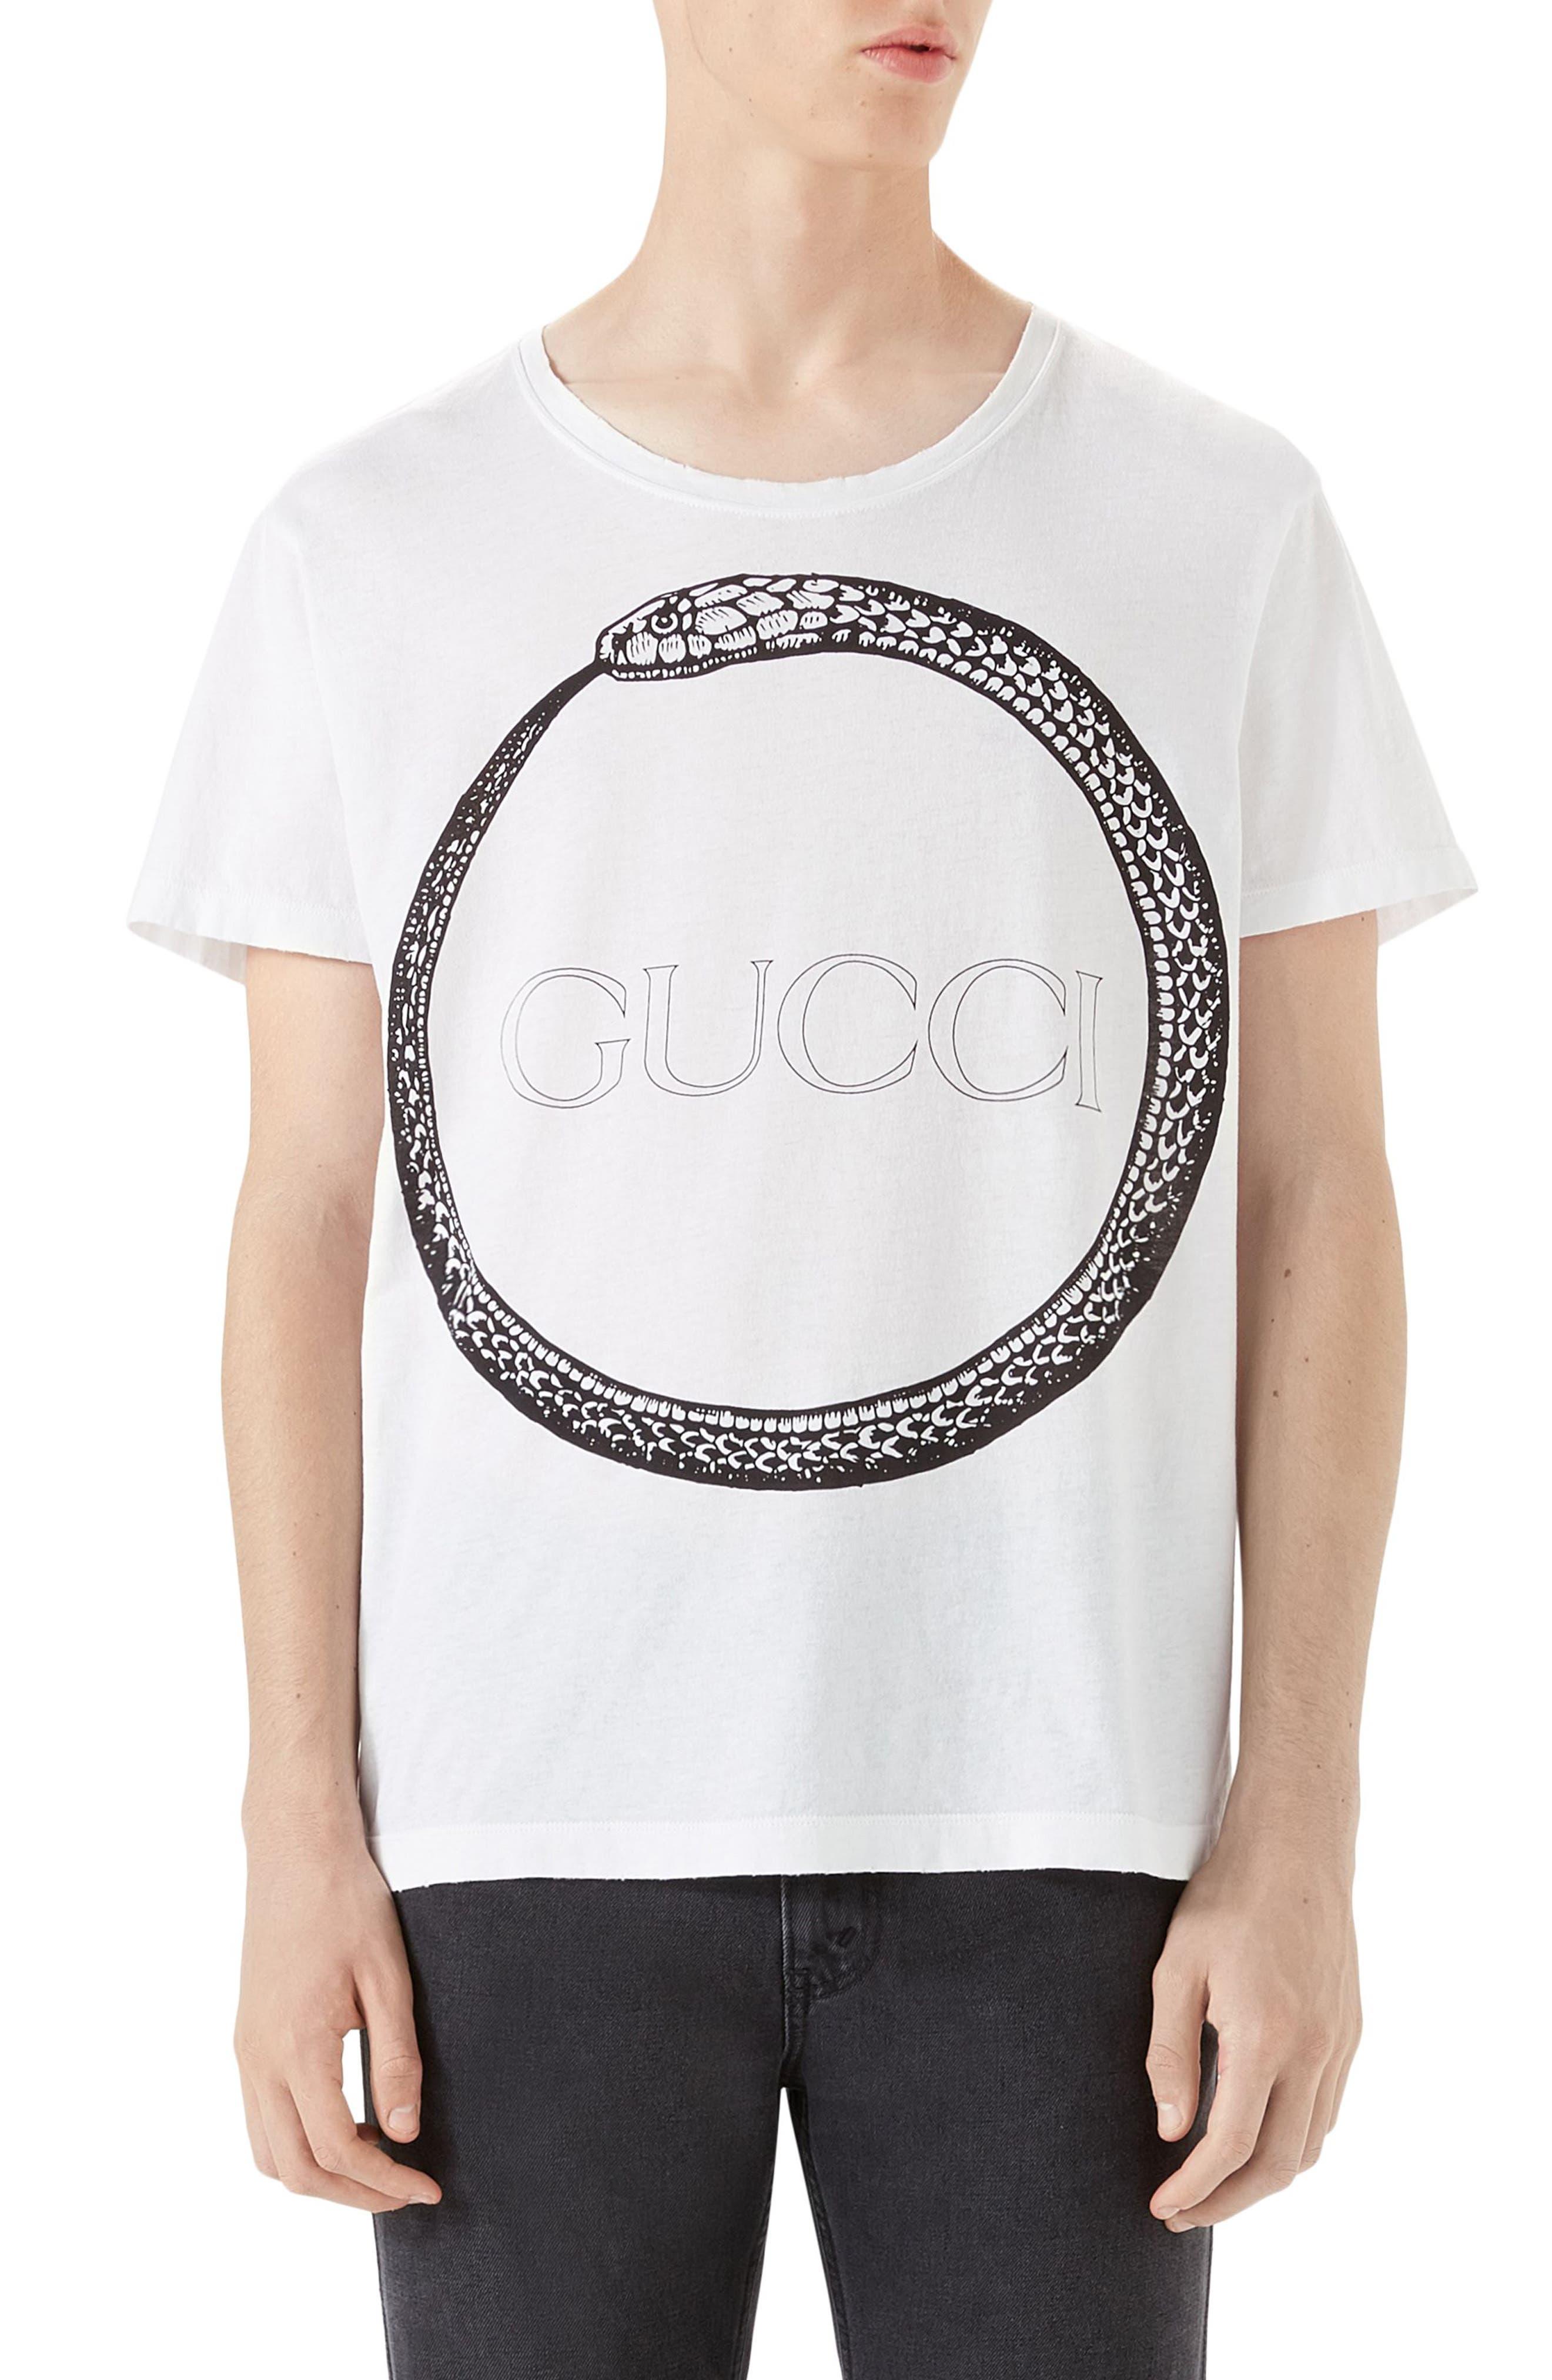 Gucci Ouroboros Logo Graphic T-Shirt